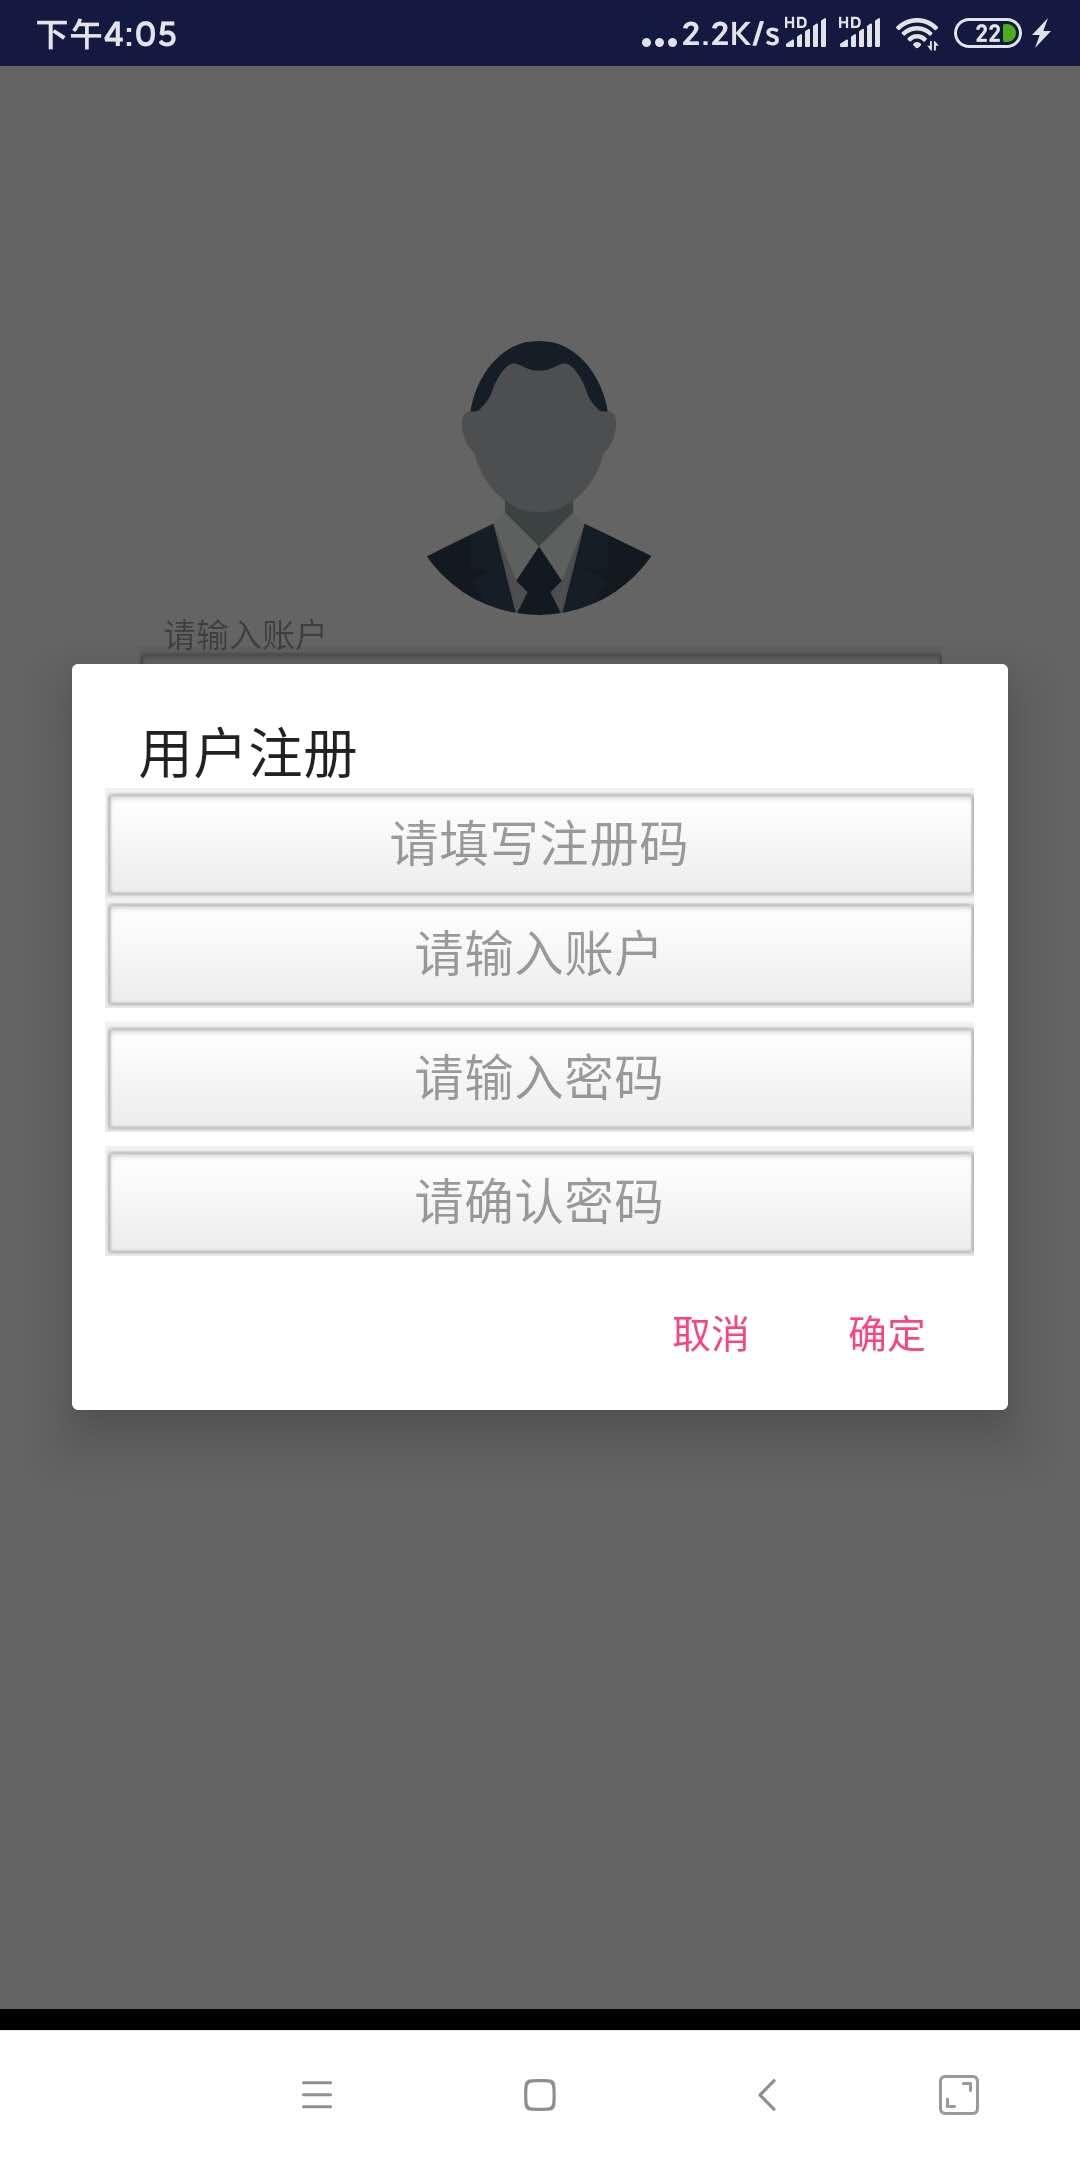 Android考试管理系统